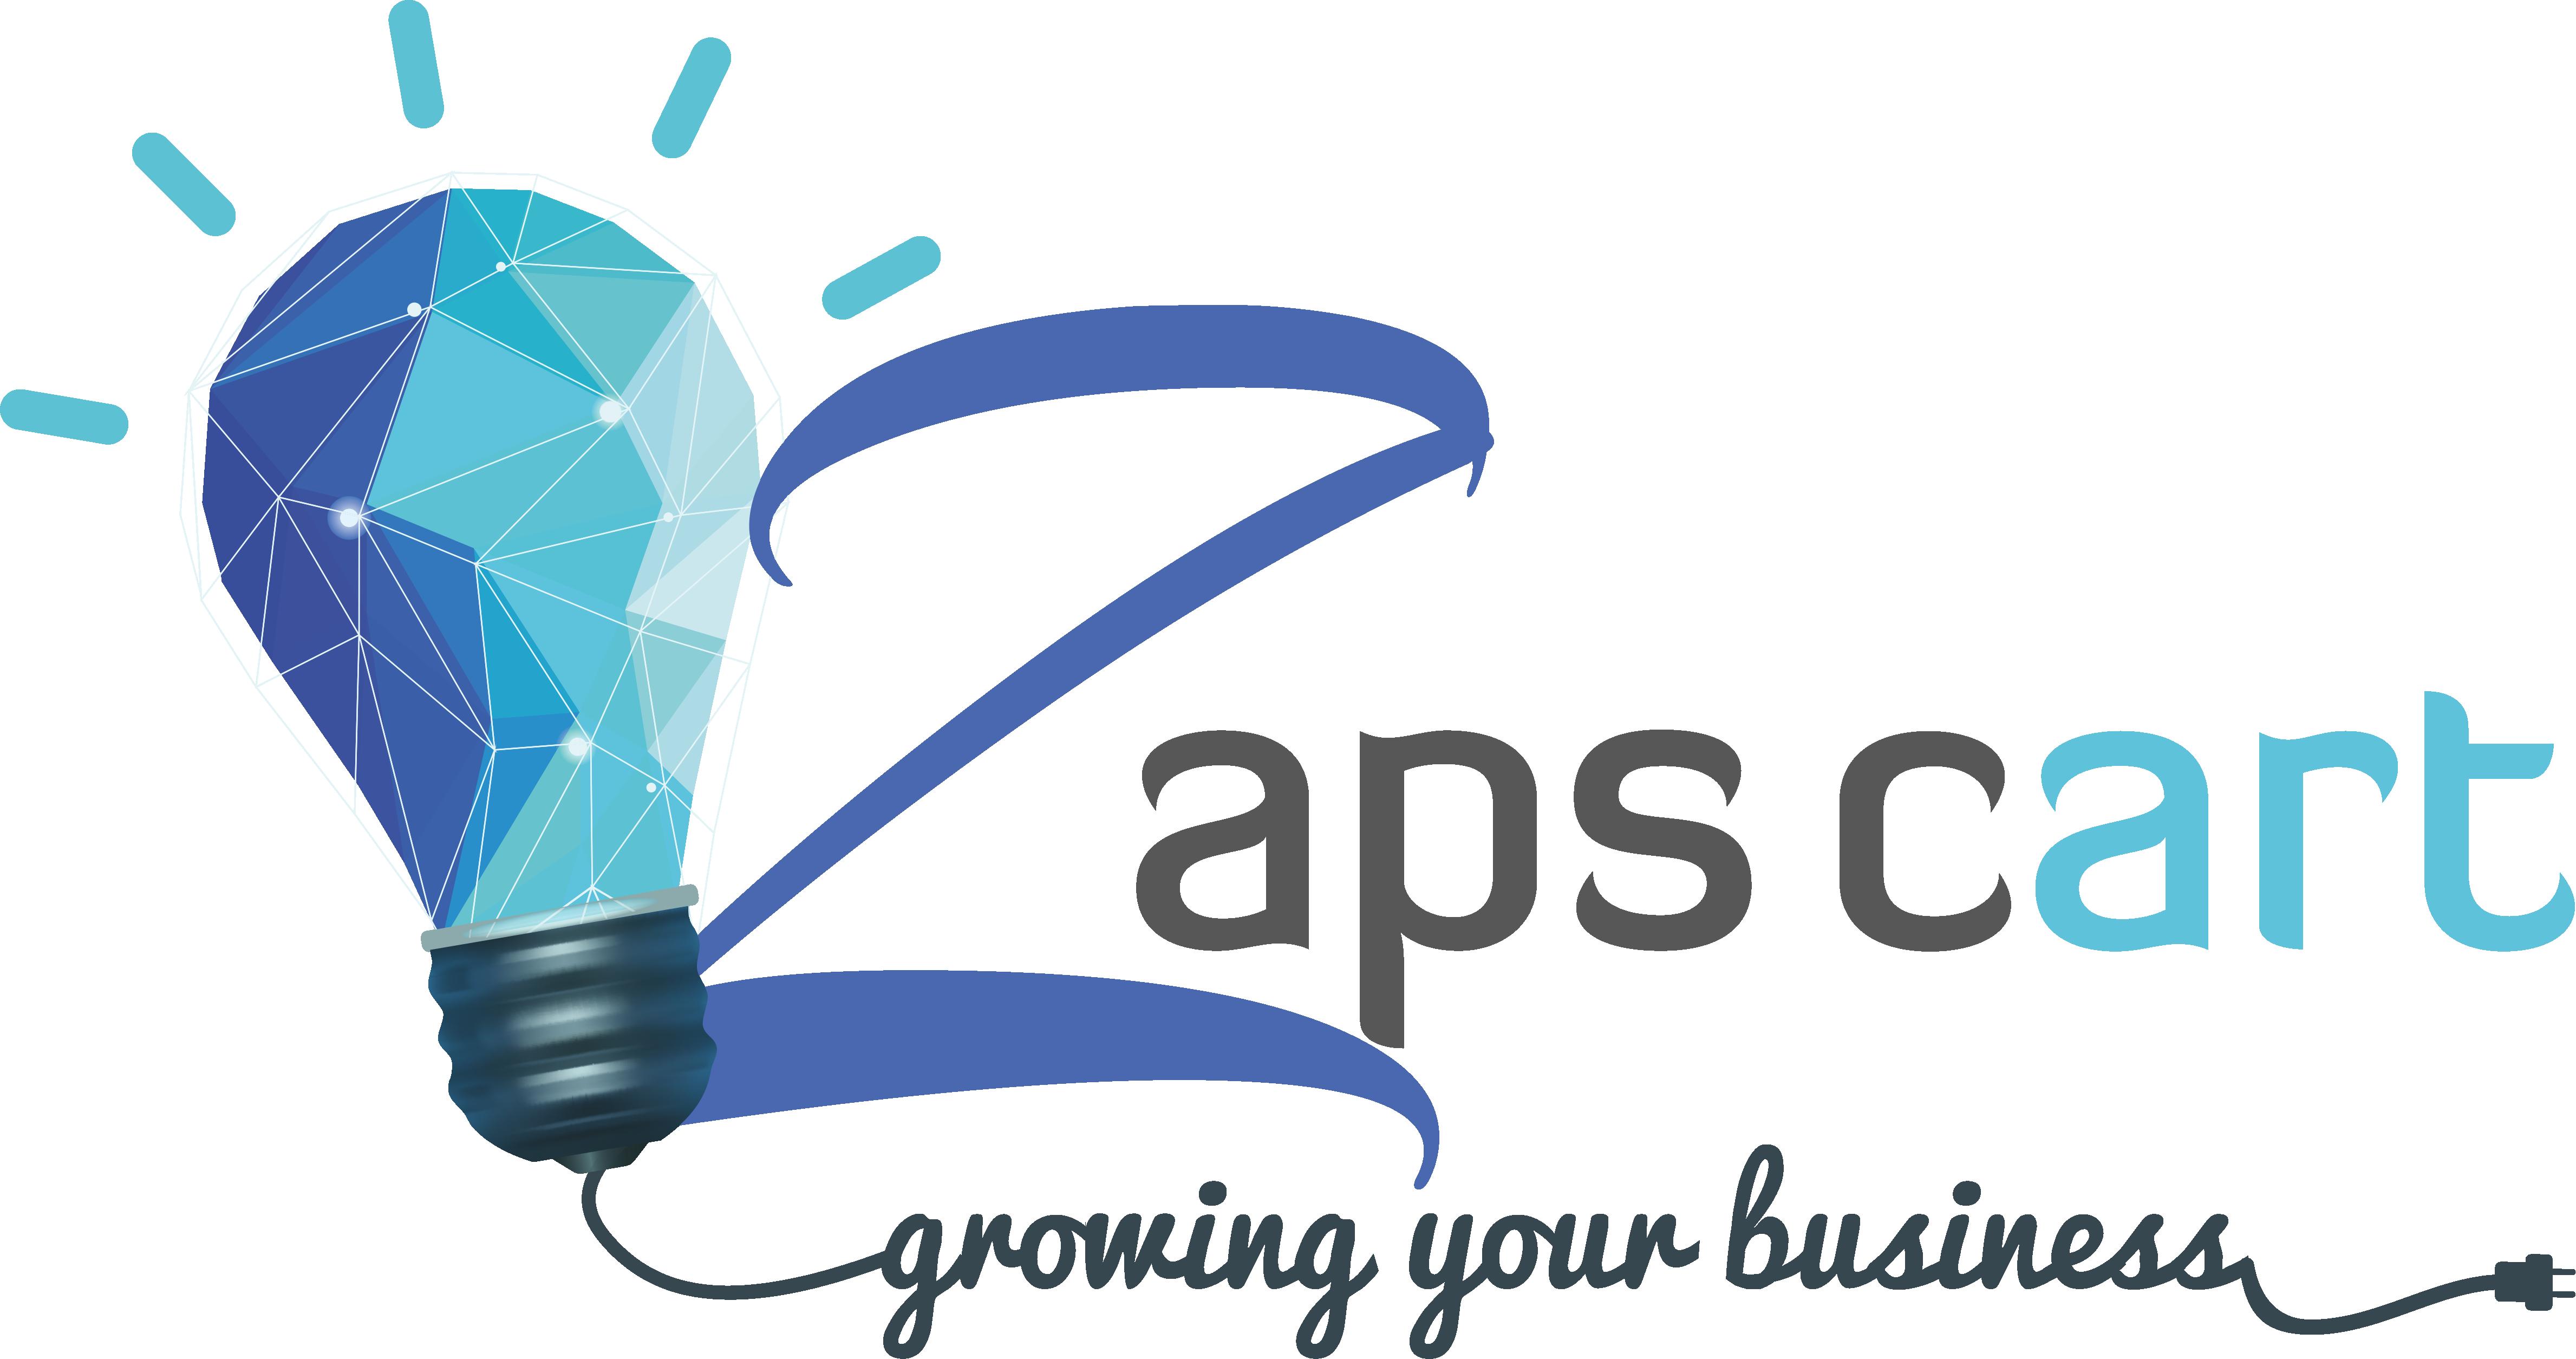 Zapscart - Growing Your Business